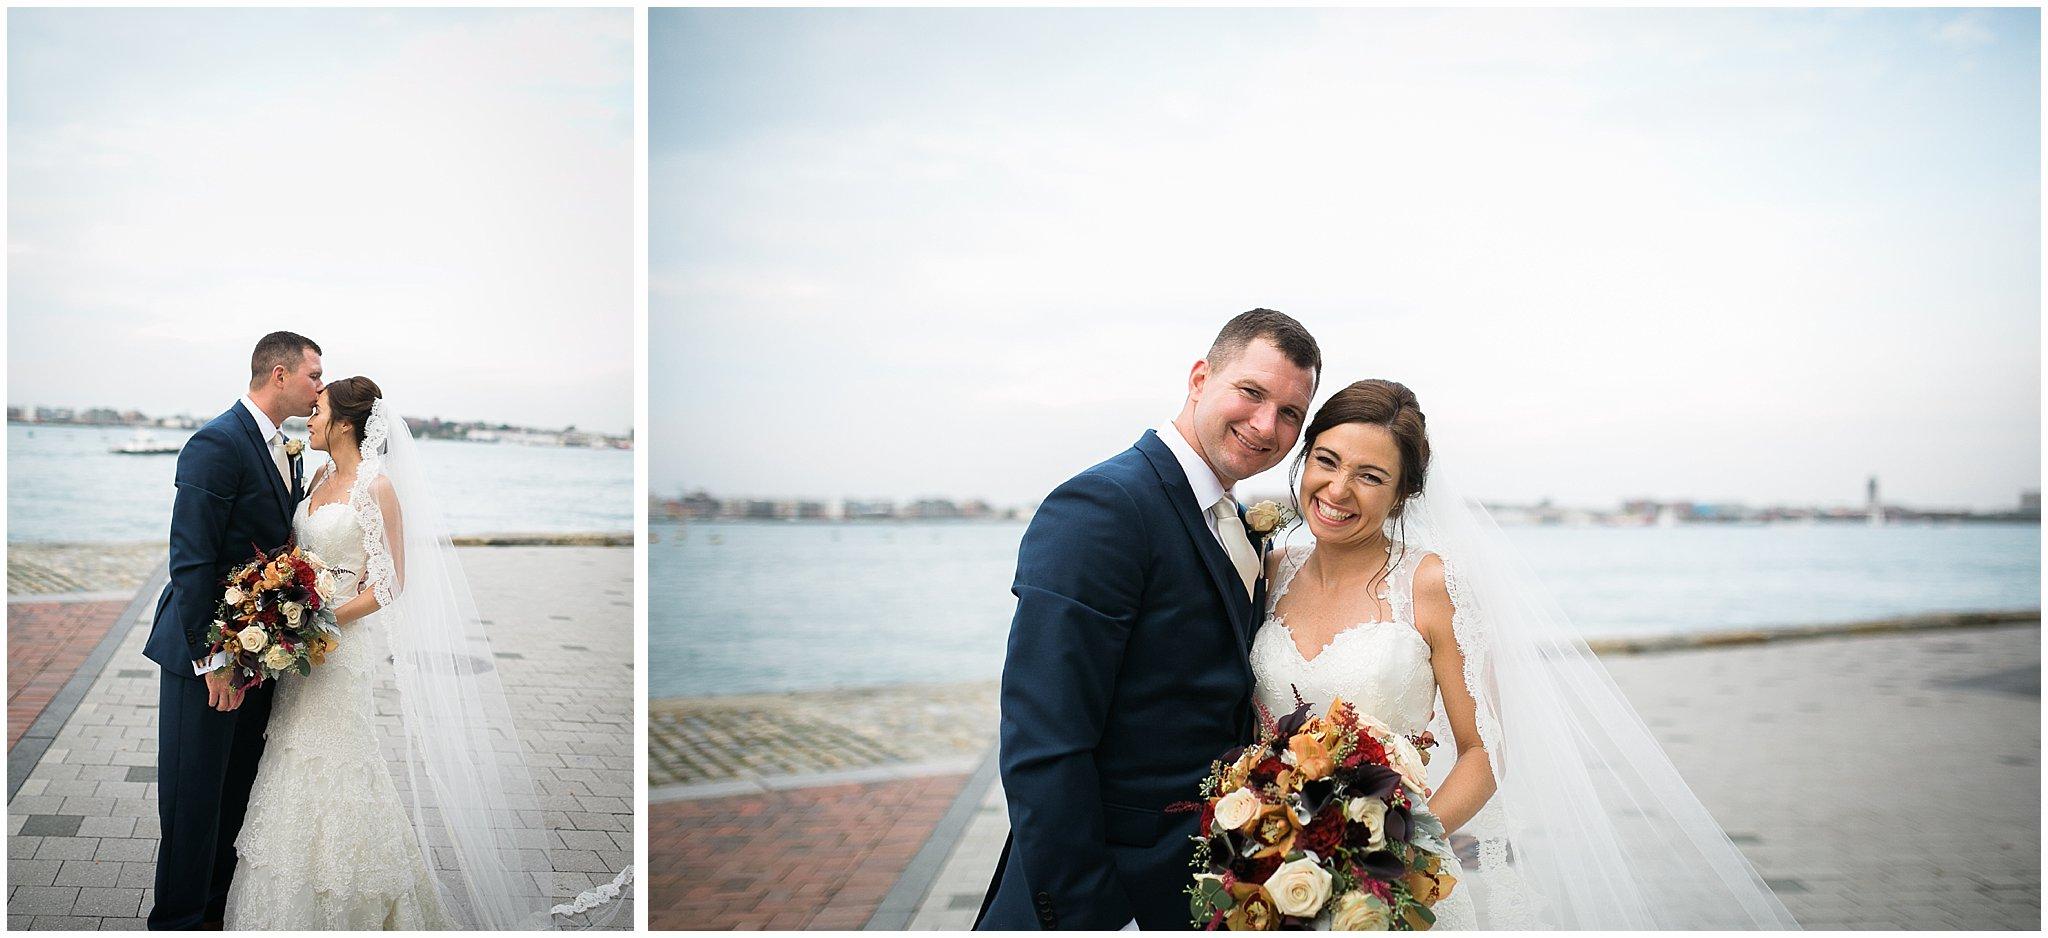 Seaport Hotel Wedding Boston Photographer Sweet Alice43.jpg